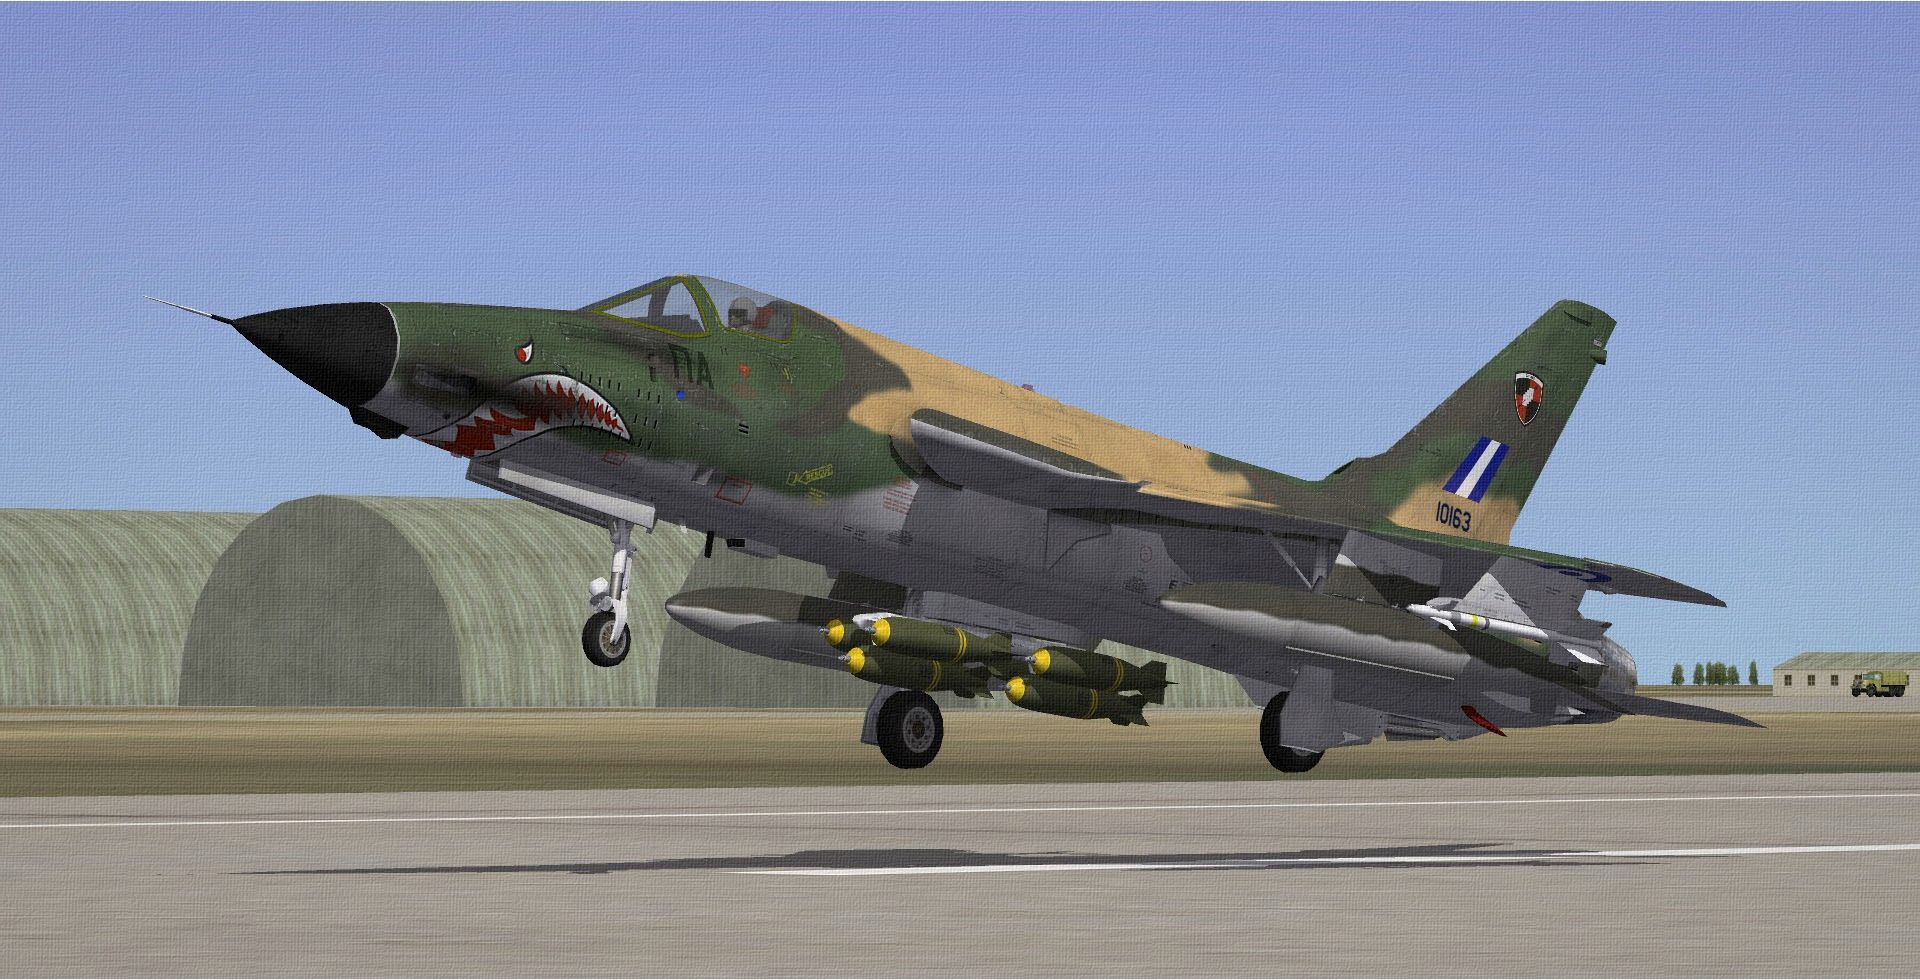 HAFF-105HTHUNDERCHIEF02_zps61681380.jpg